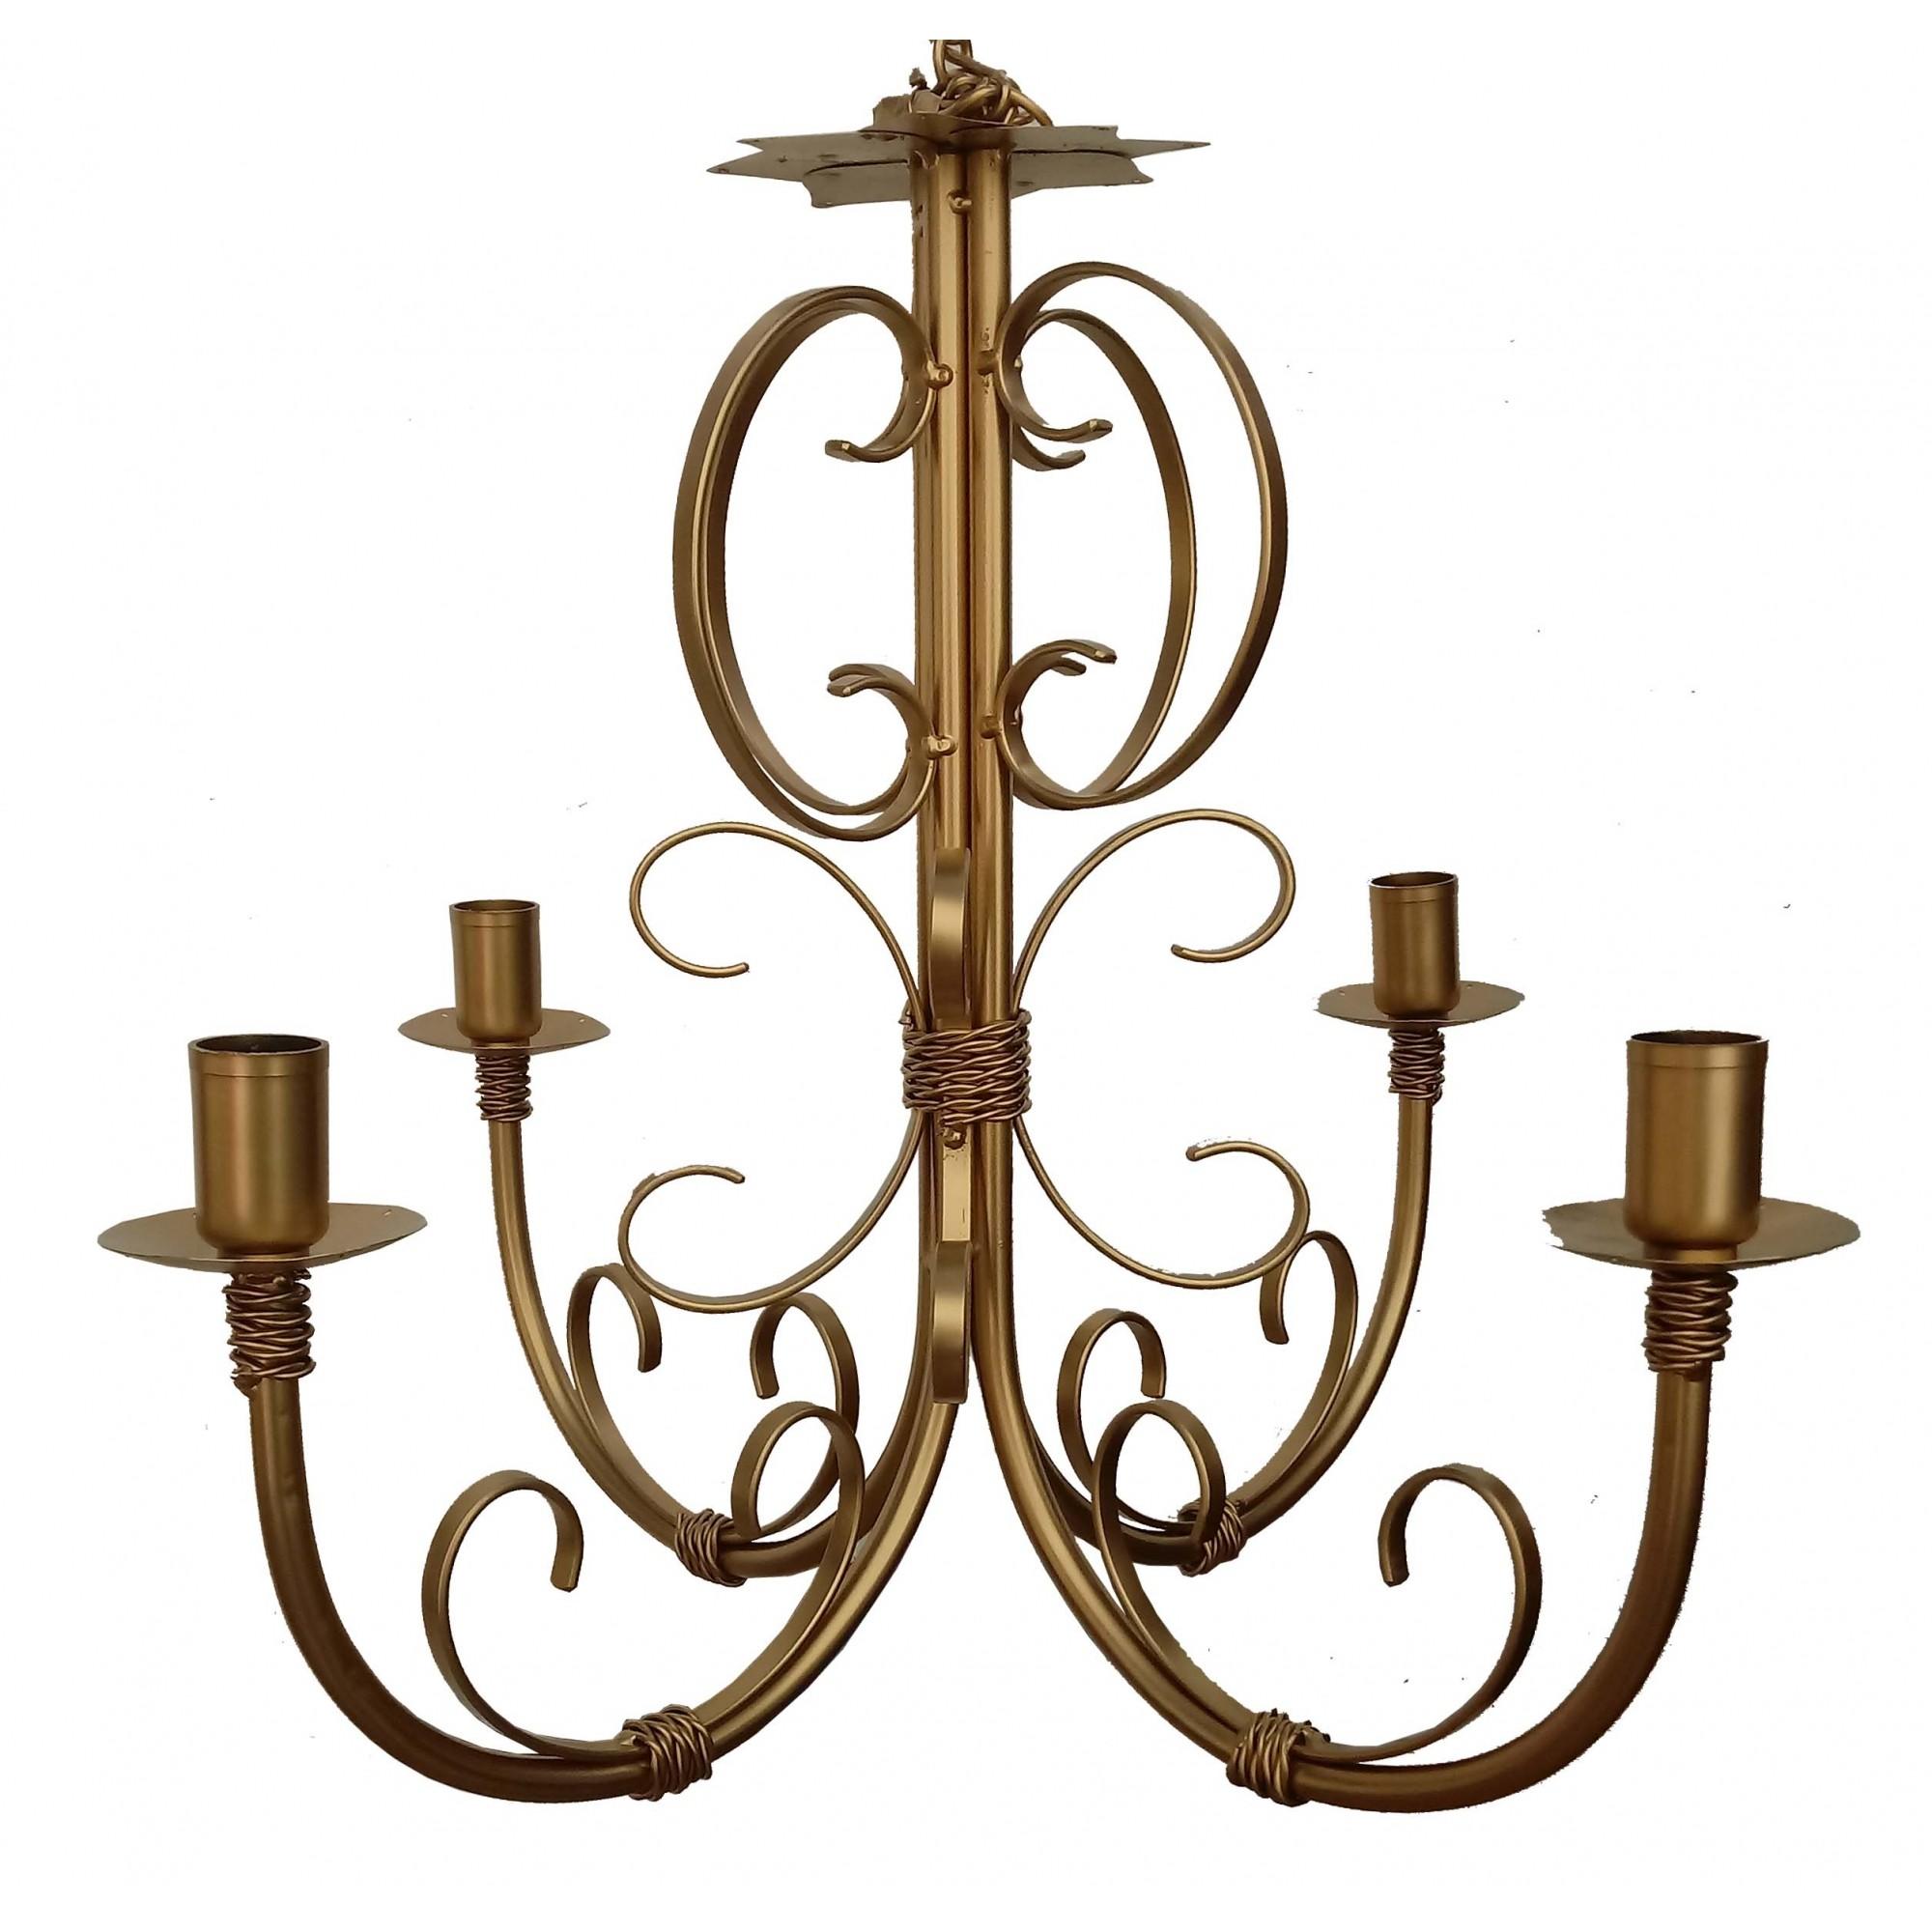 Lustre De Ferro Dourado Rustico -> Lustre Para Sala De Jantar Dourado